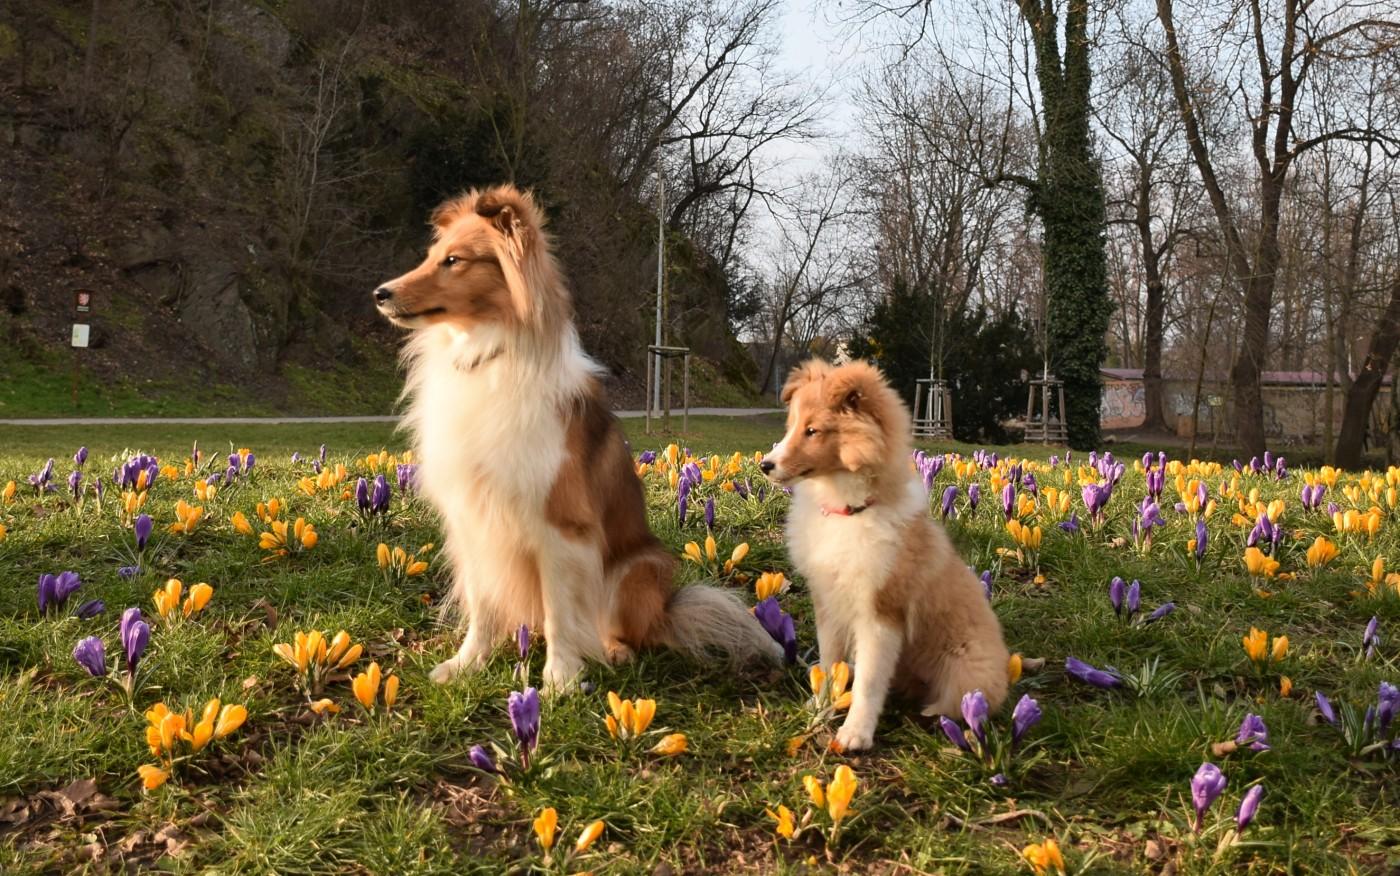 Rozkvetlé krásky Angie a Lilly